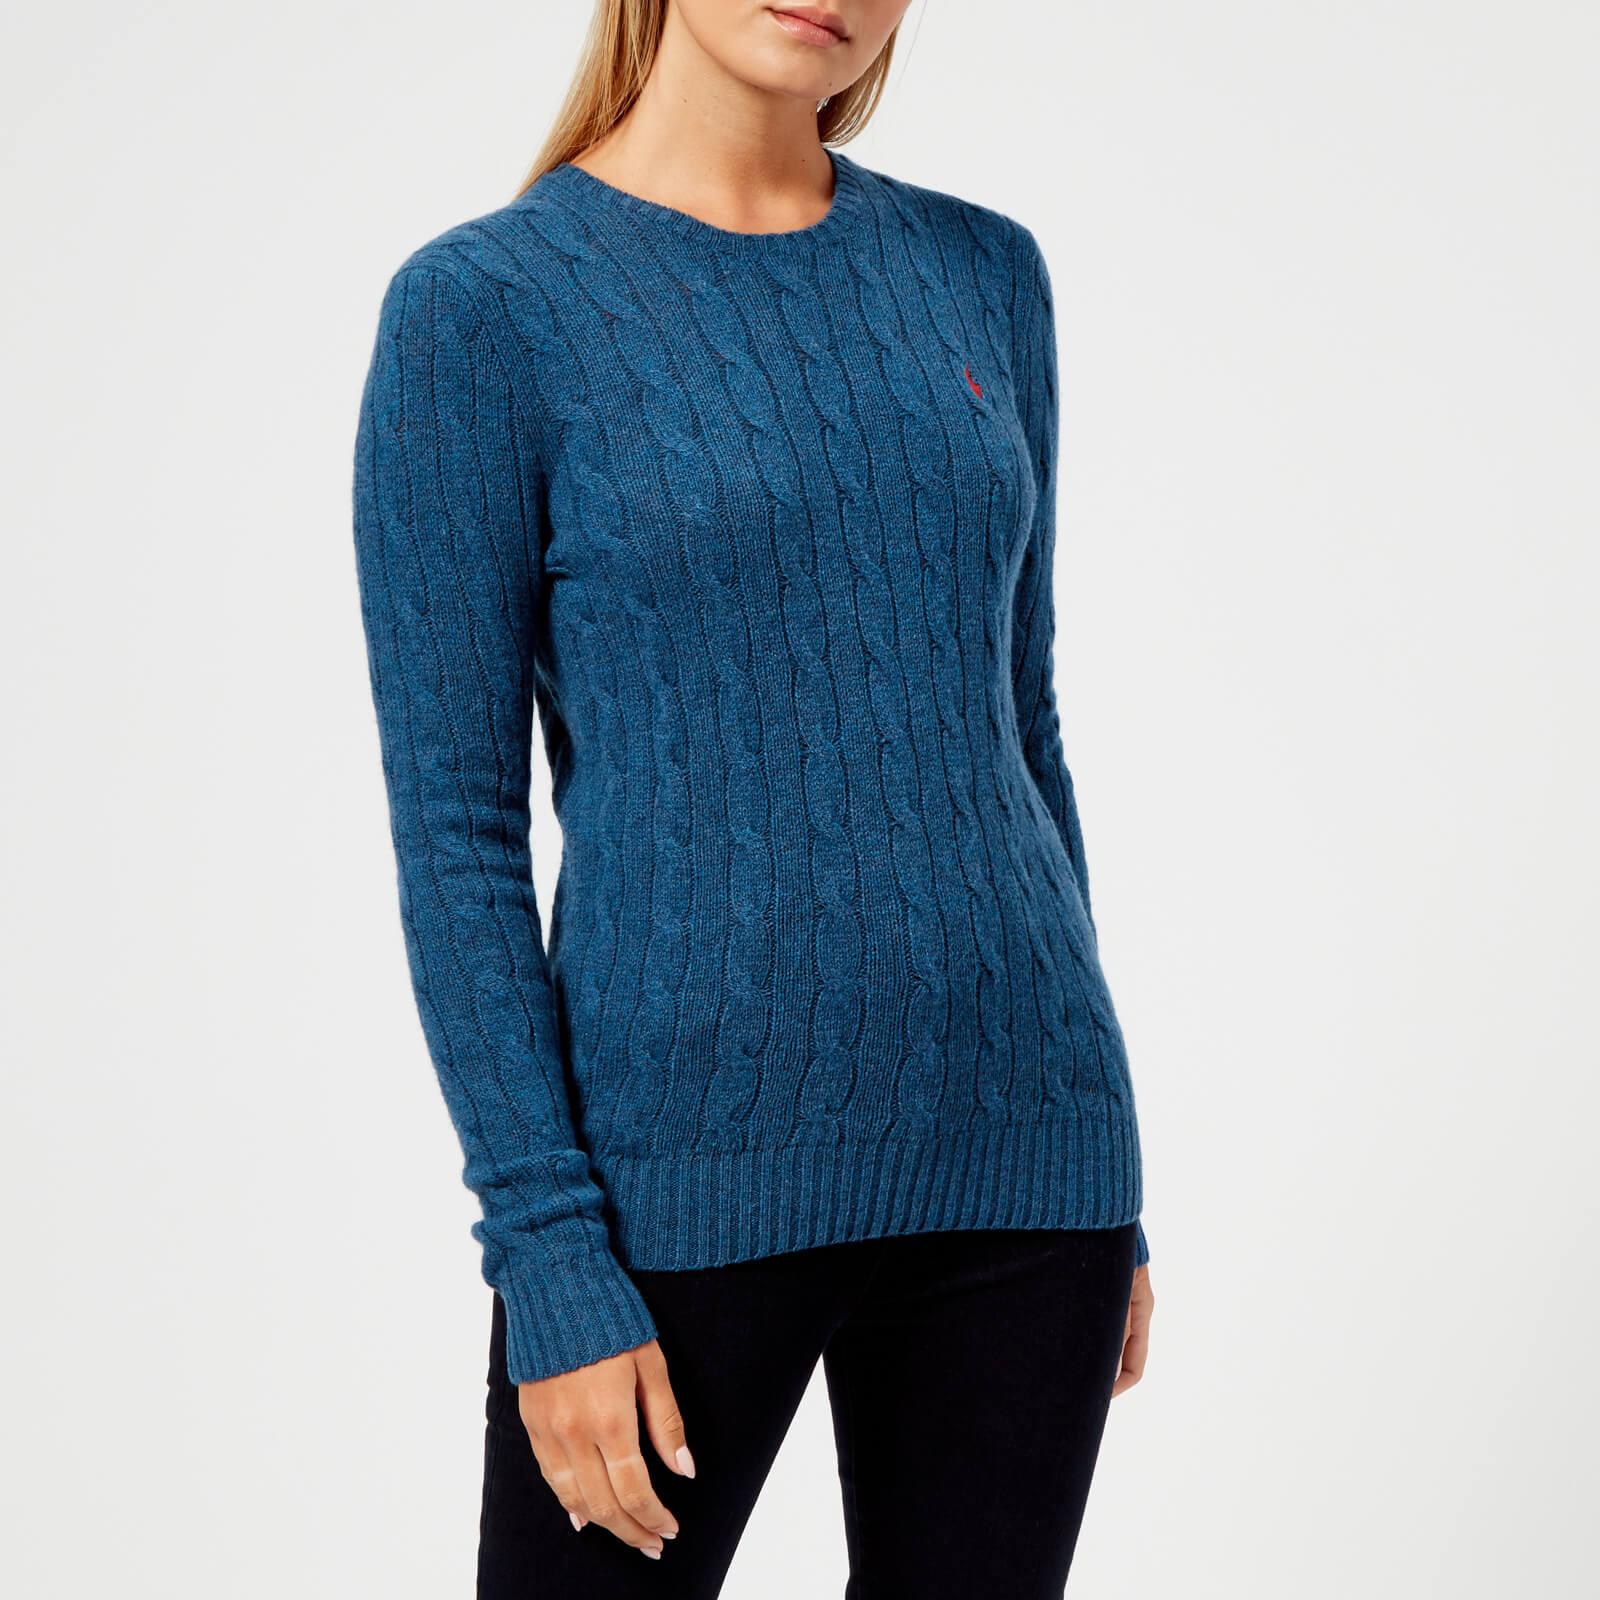 83495e156a82 Polo Ralph Lauren Women's Juliana Jumper - Light Blue - Free UK Delivery  over £50